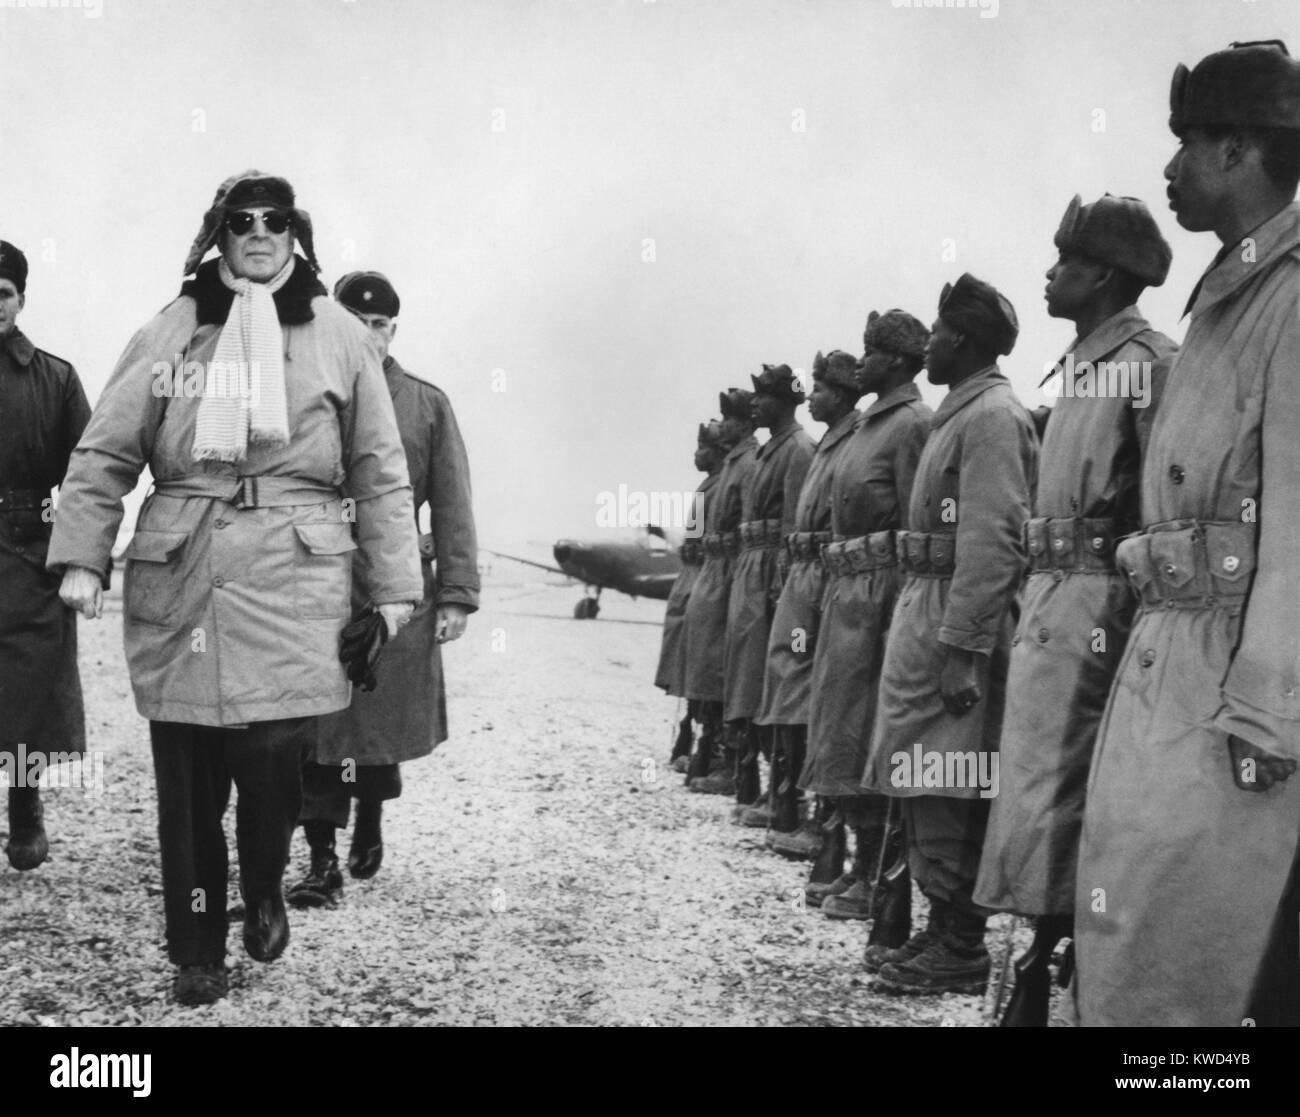 General Douglas MacArthur on an inspection tour of the South Korean Forces. Feb. 21, 1951. Korean War, 1950-53. - Stock Image